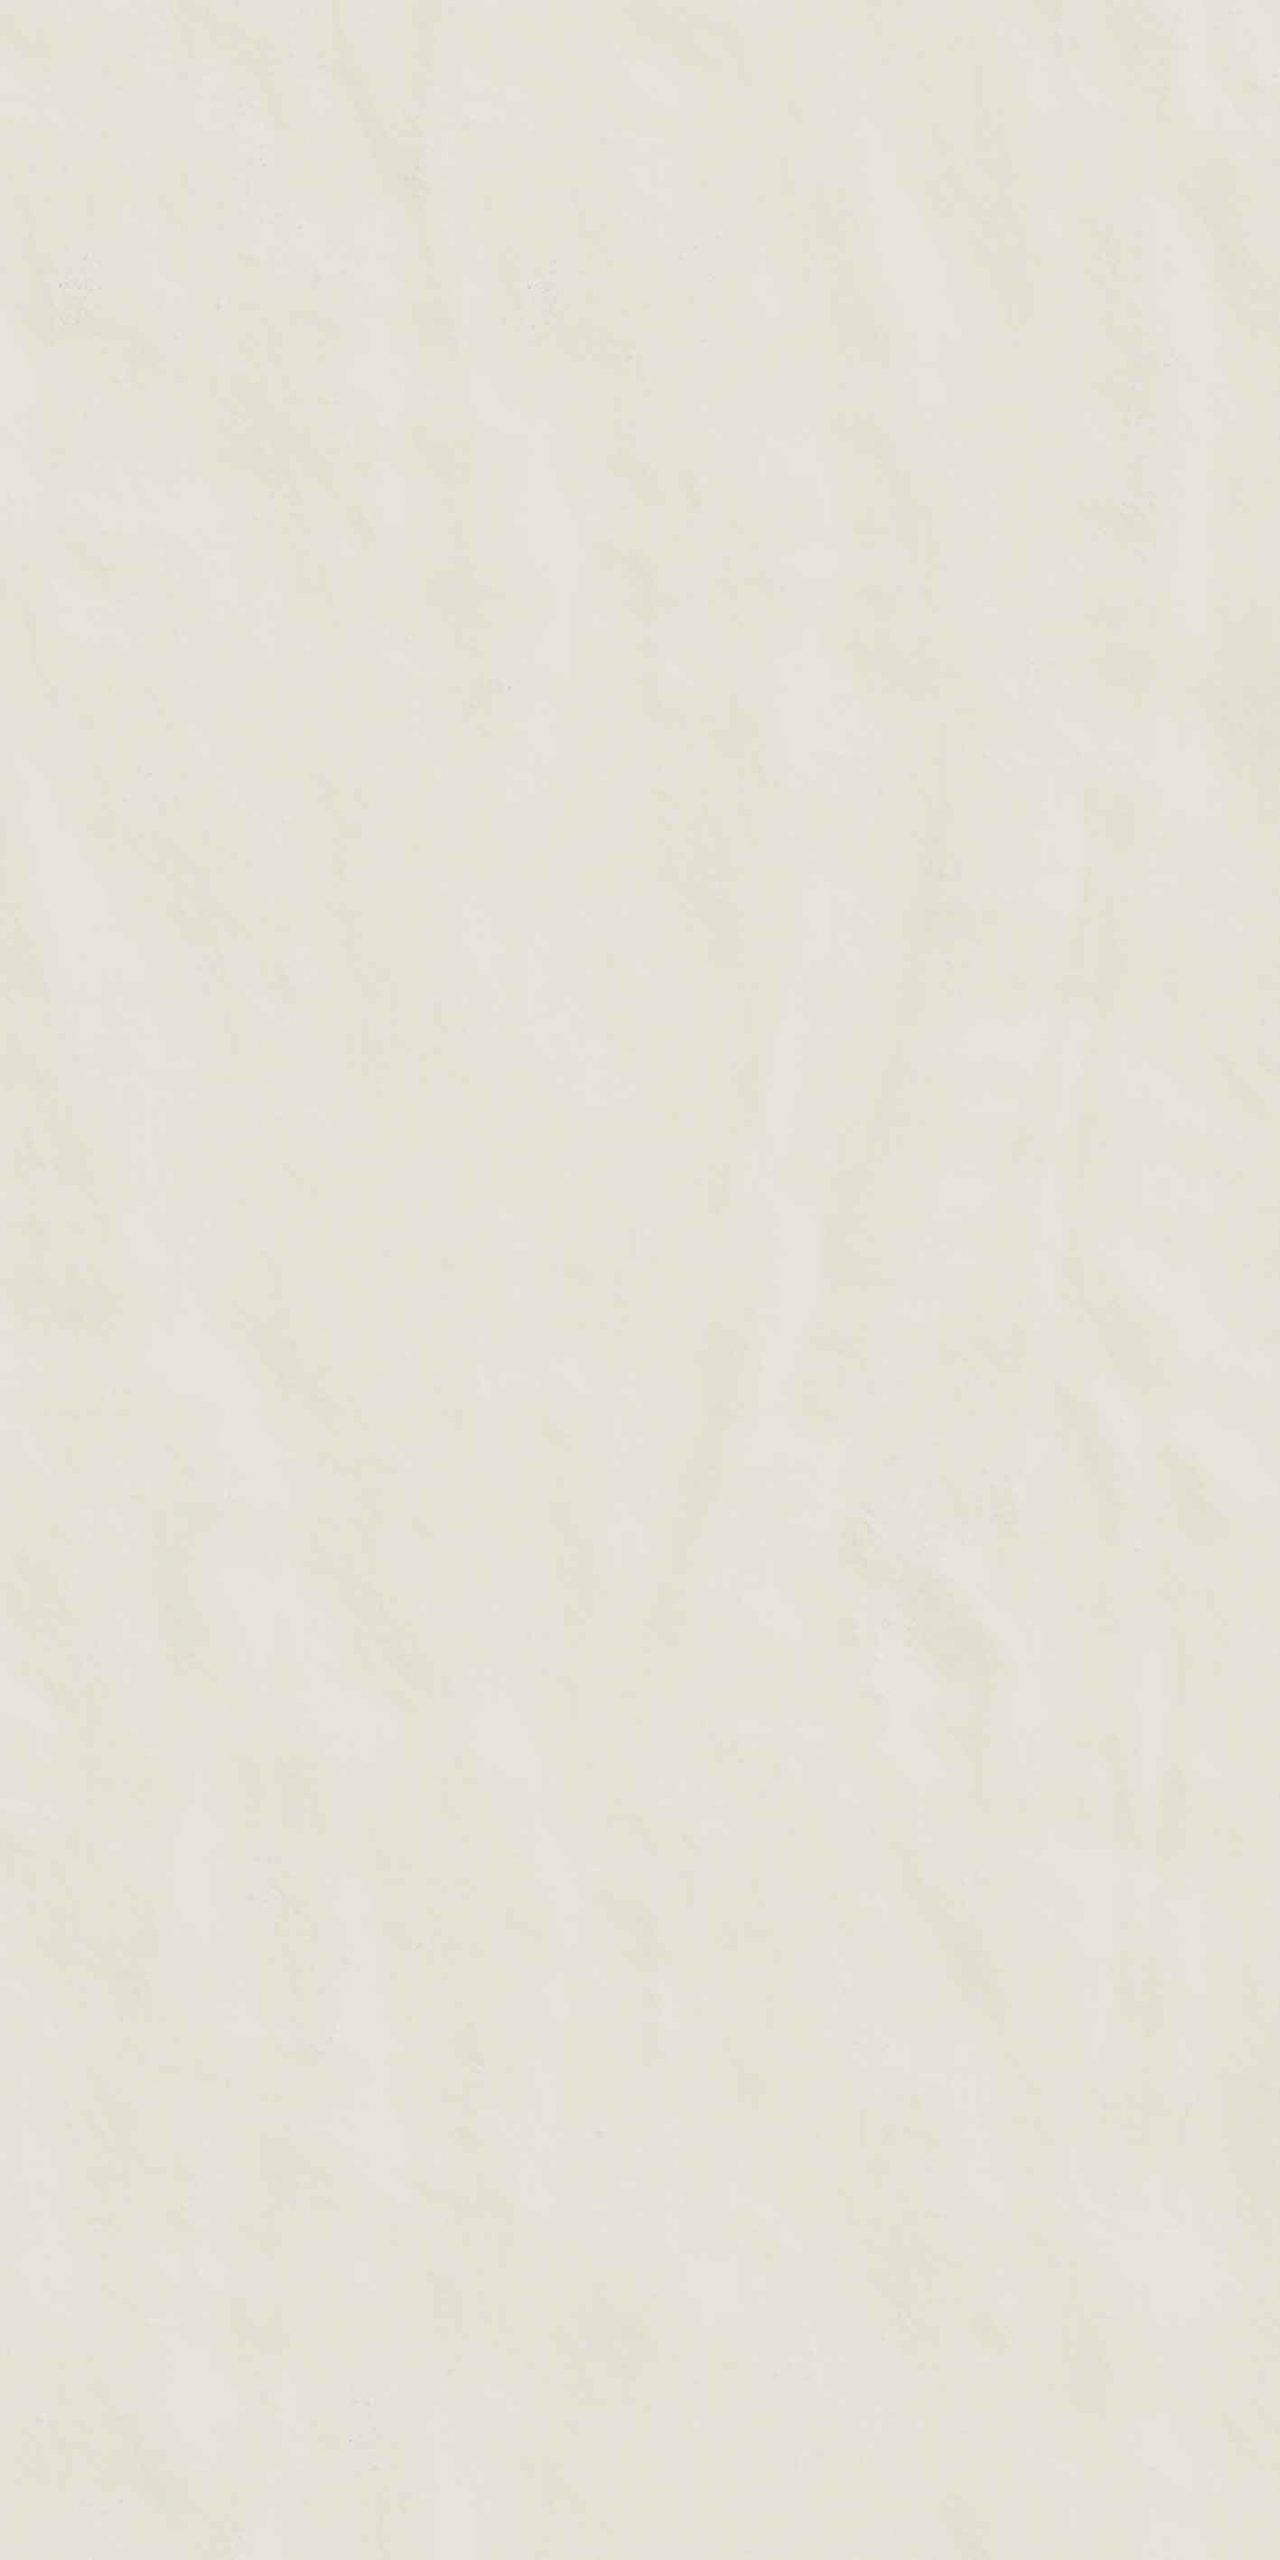 Neutra 6.0 Bianco 01 Matte 10mm 60 x 120